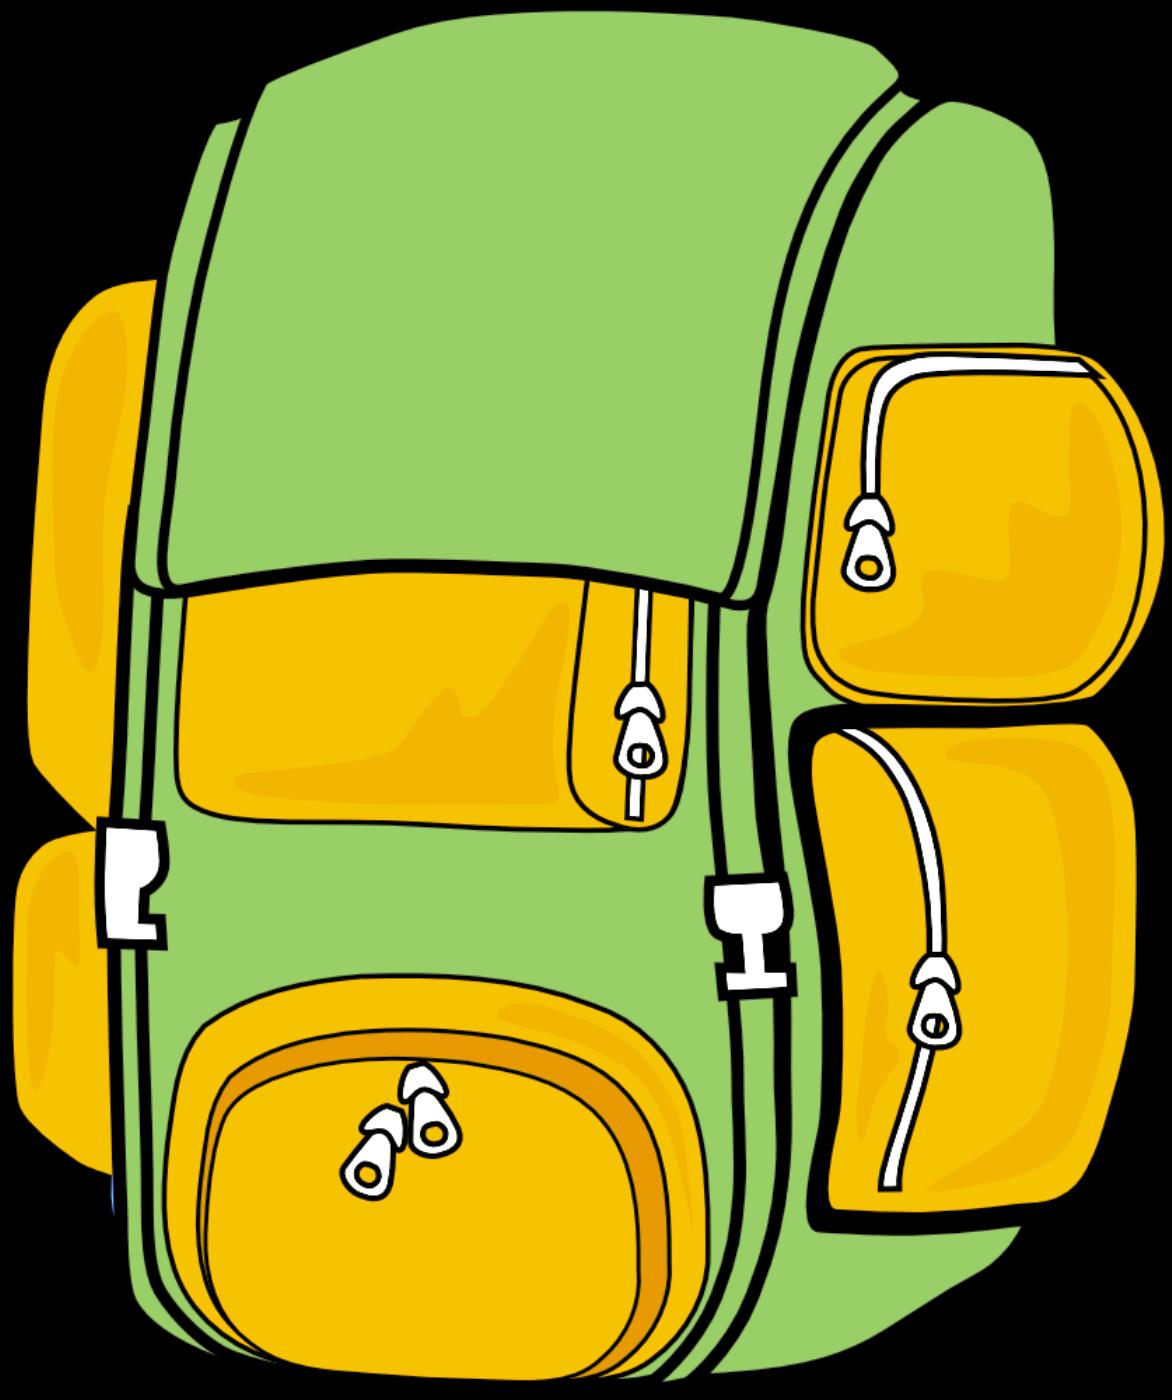 Bookbag backpack clipart 6 image